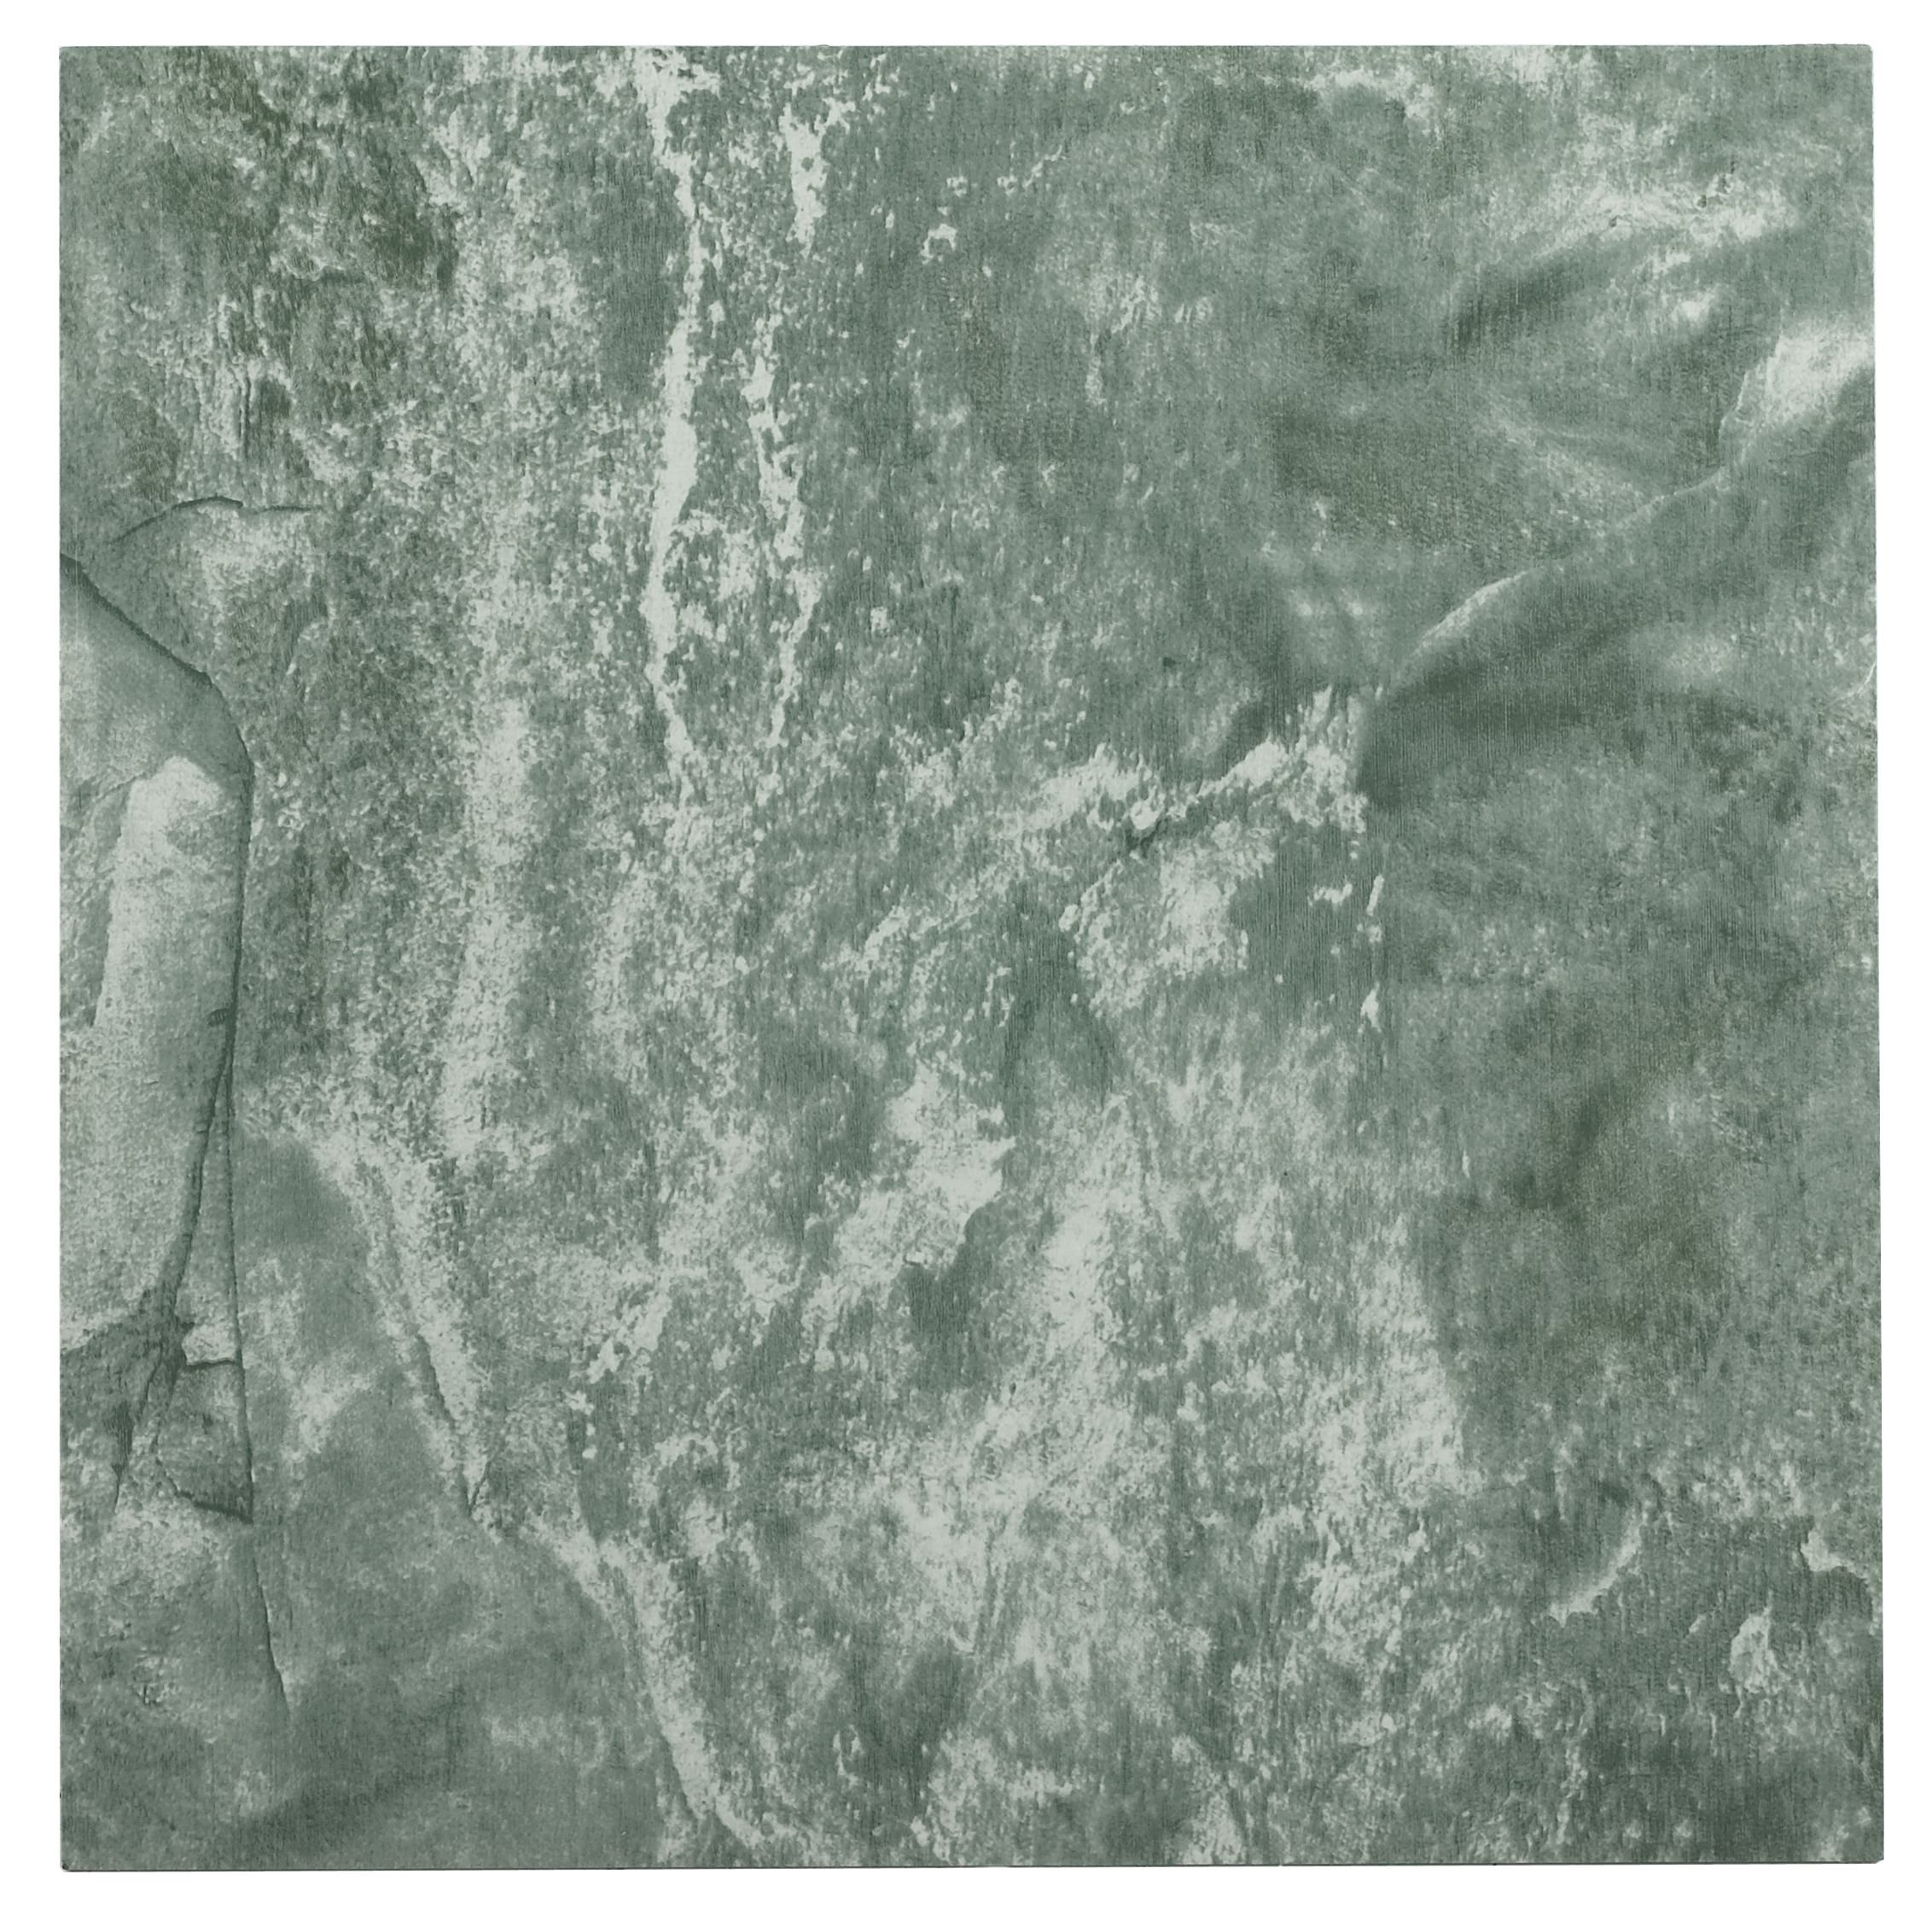 Achim Home Furnishings FTVMA42220 Nexus 12-Inch Vinyl Tile, Marble Verde Vein, 20-Pack by Achim Home Furnishings (Image #5)